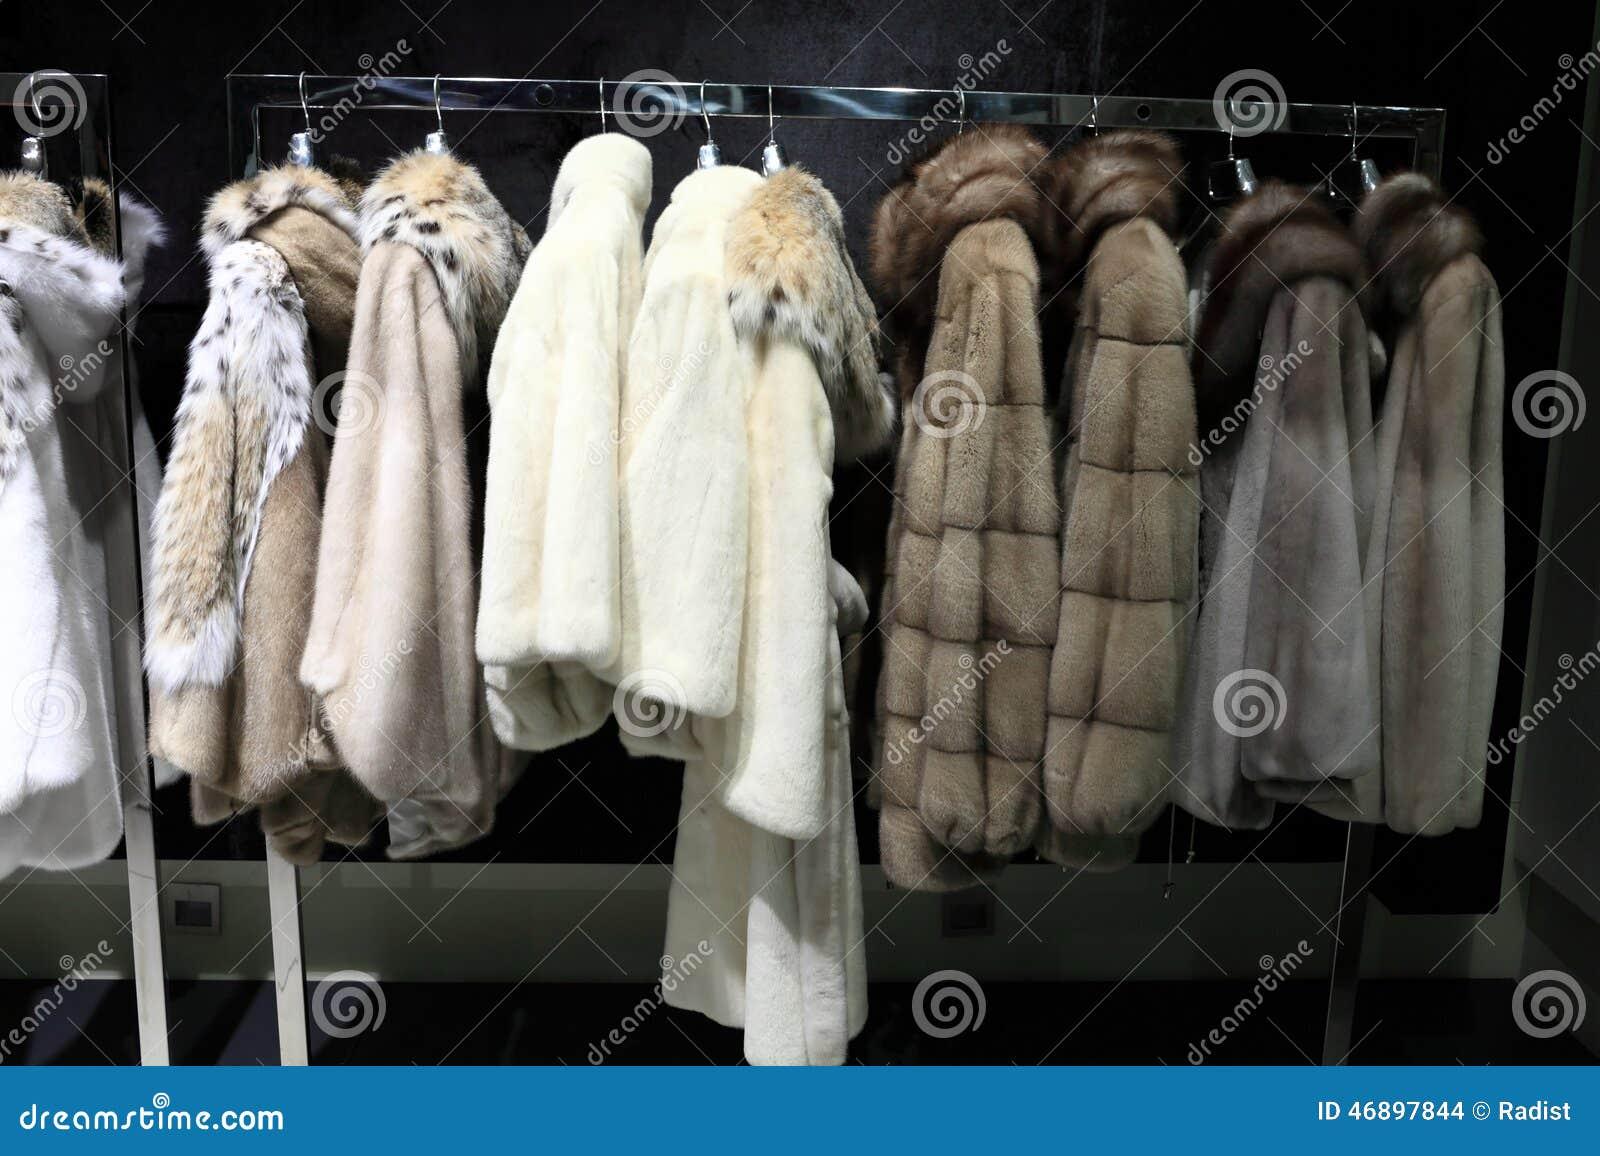 Fur coats on the hangers stock photo. Image of display - 46897844